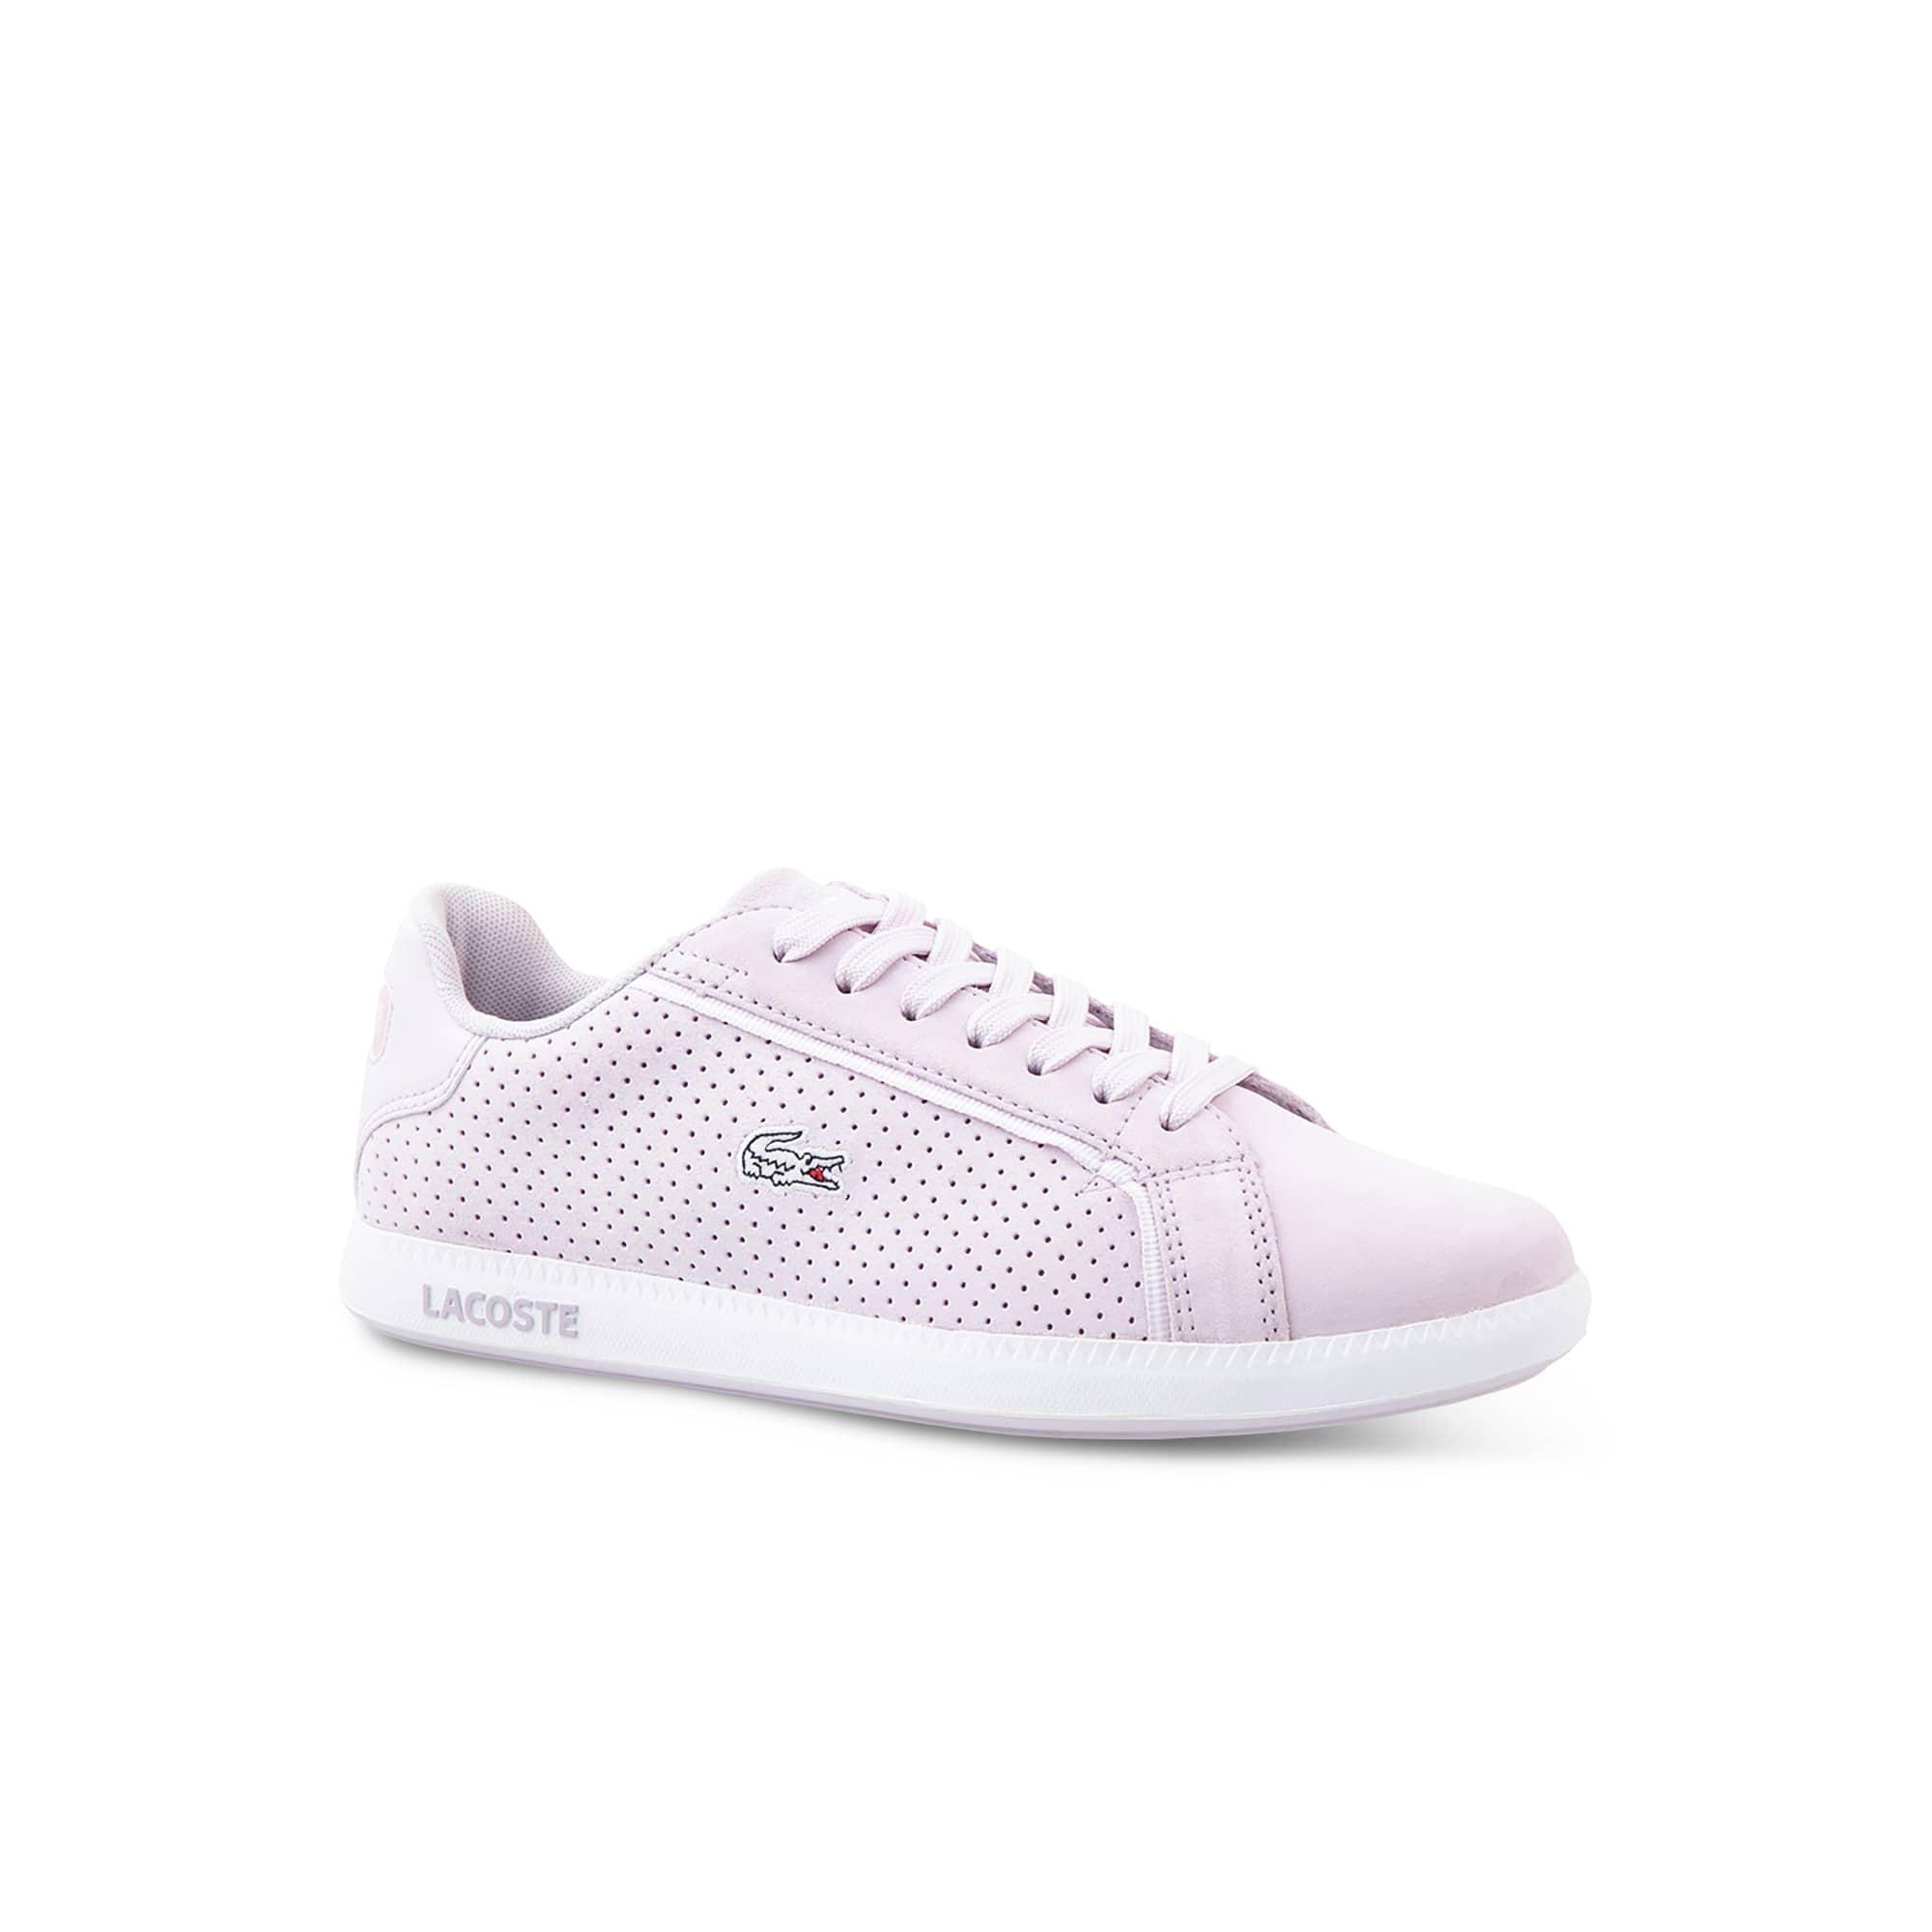 7a30e9810 Shoes for Women